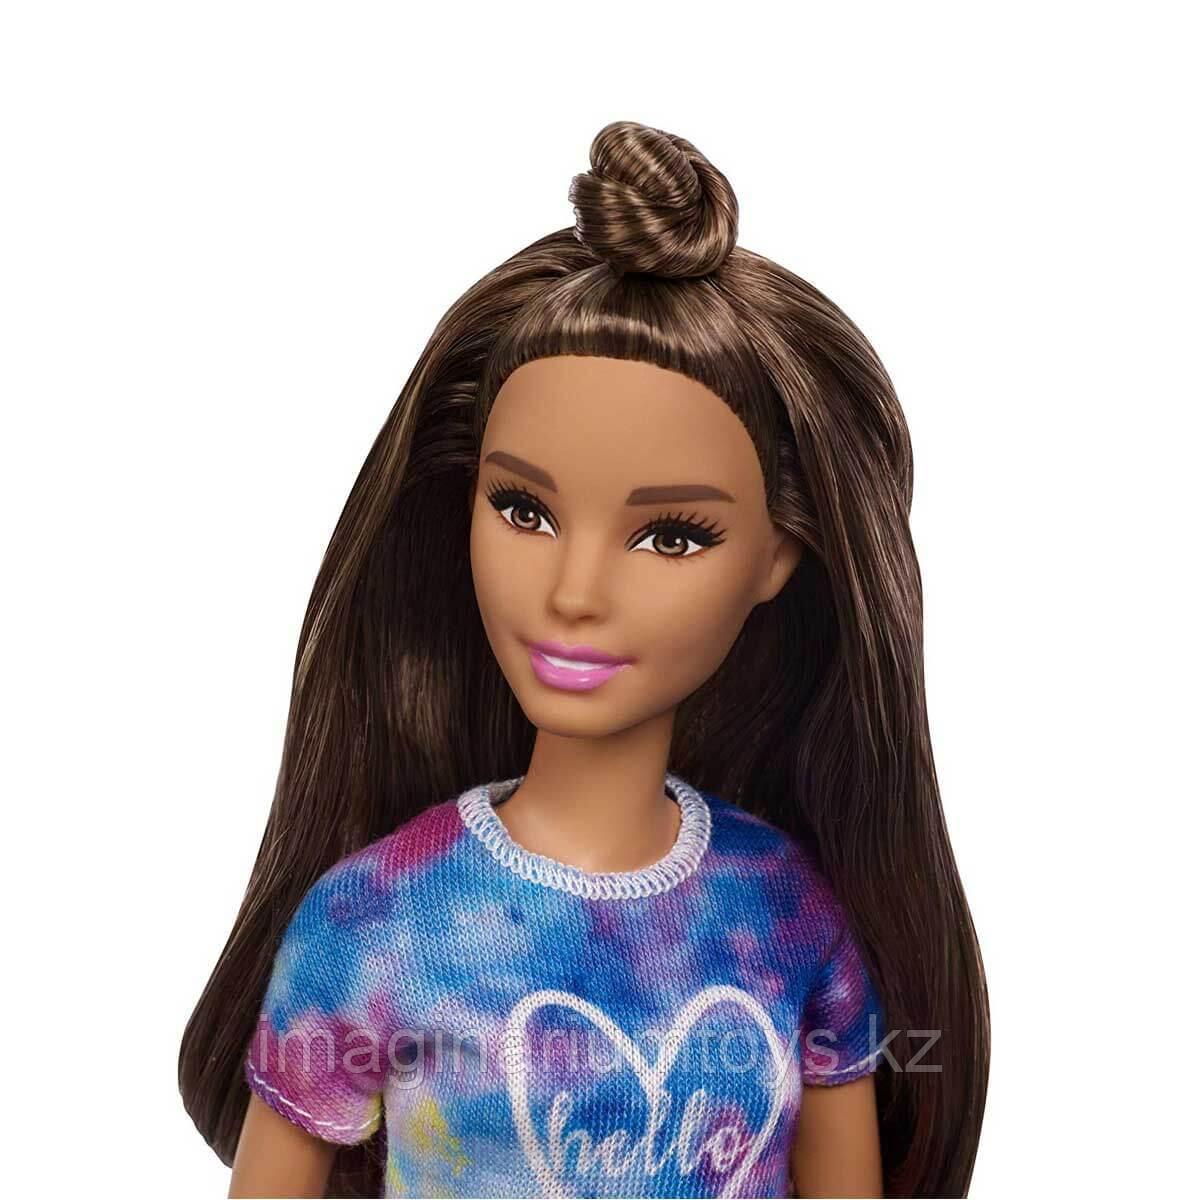 Кукла Барби модница шатенка #112 - фото 2